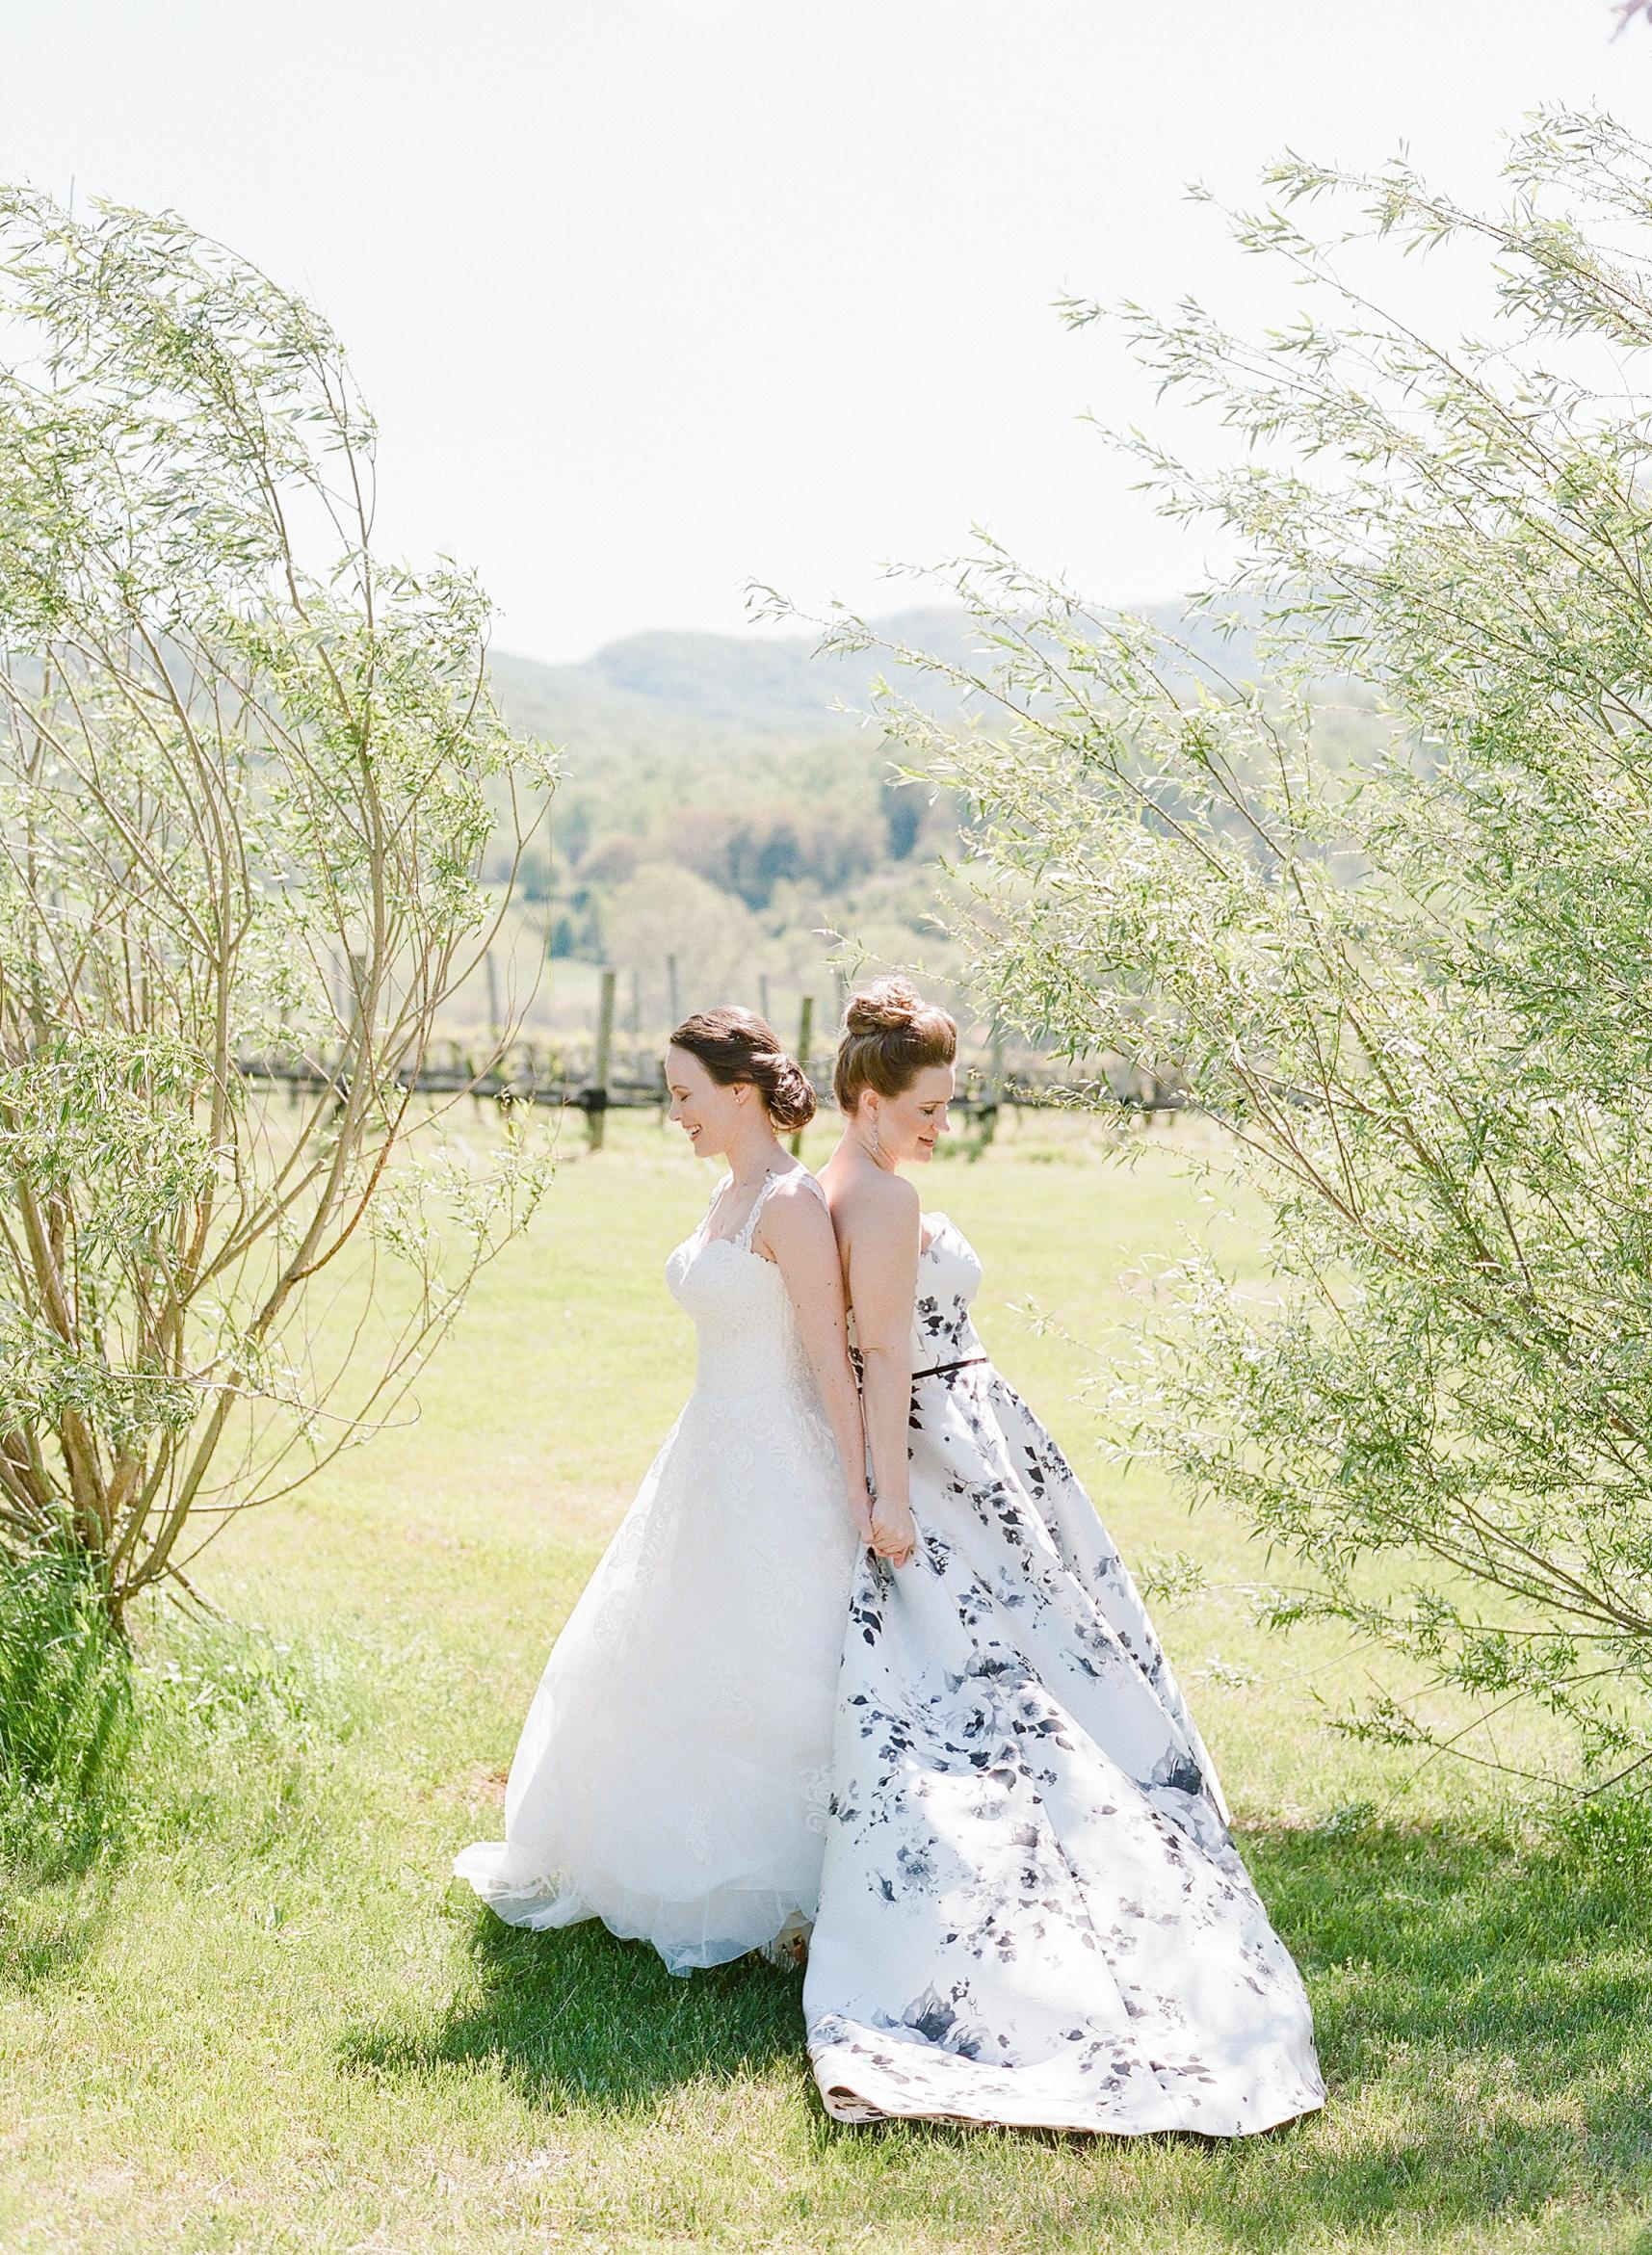 mechelle julia wedding brides couple first look